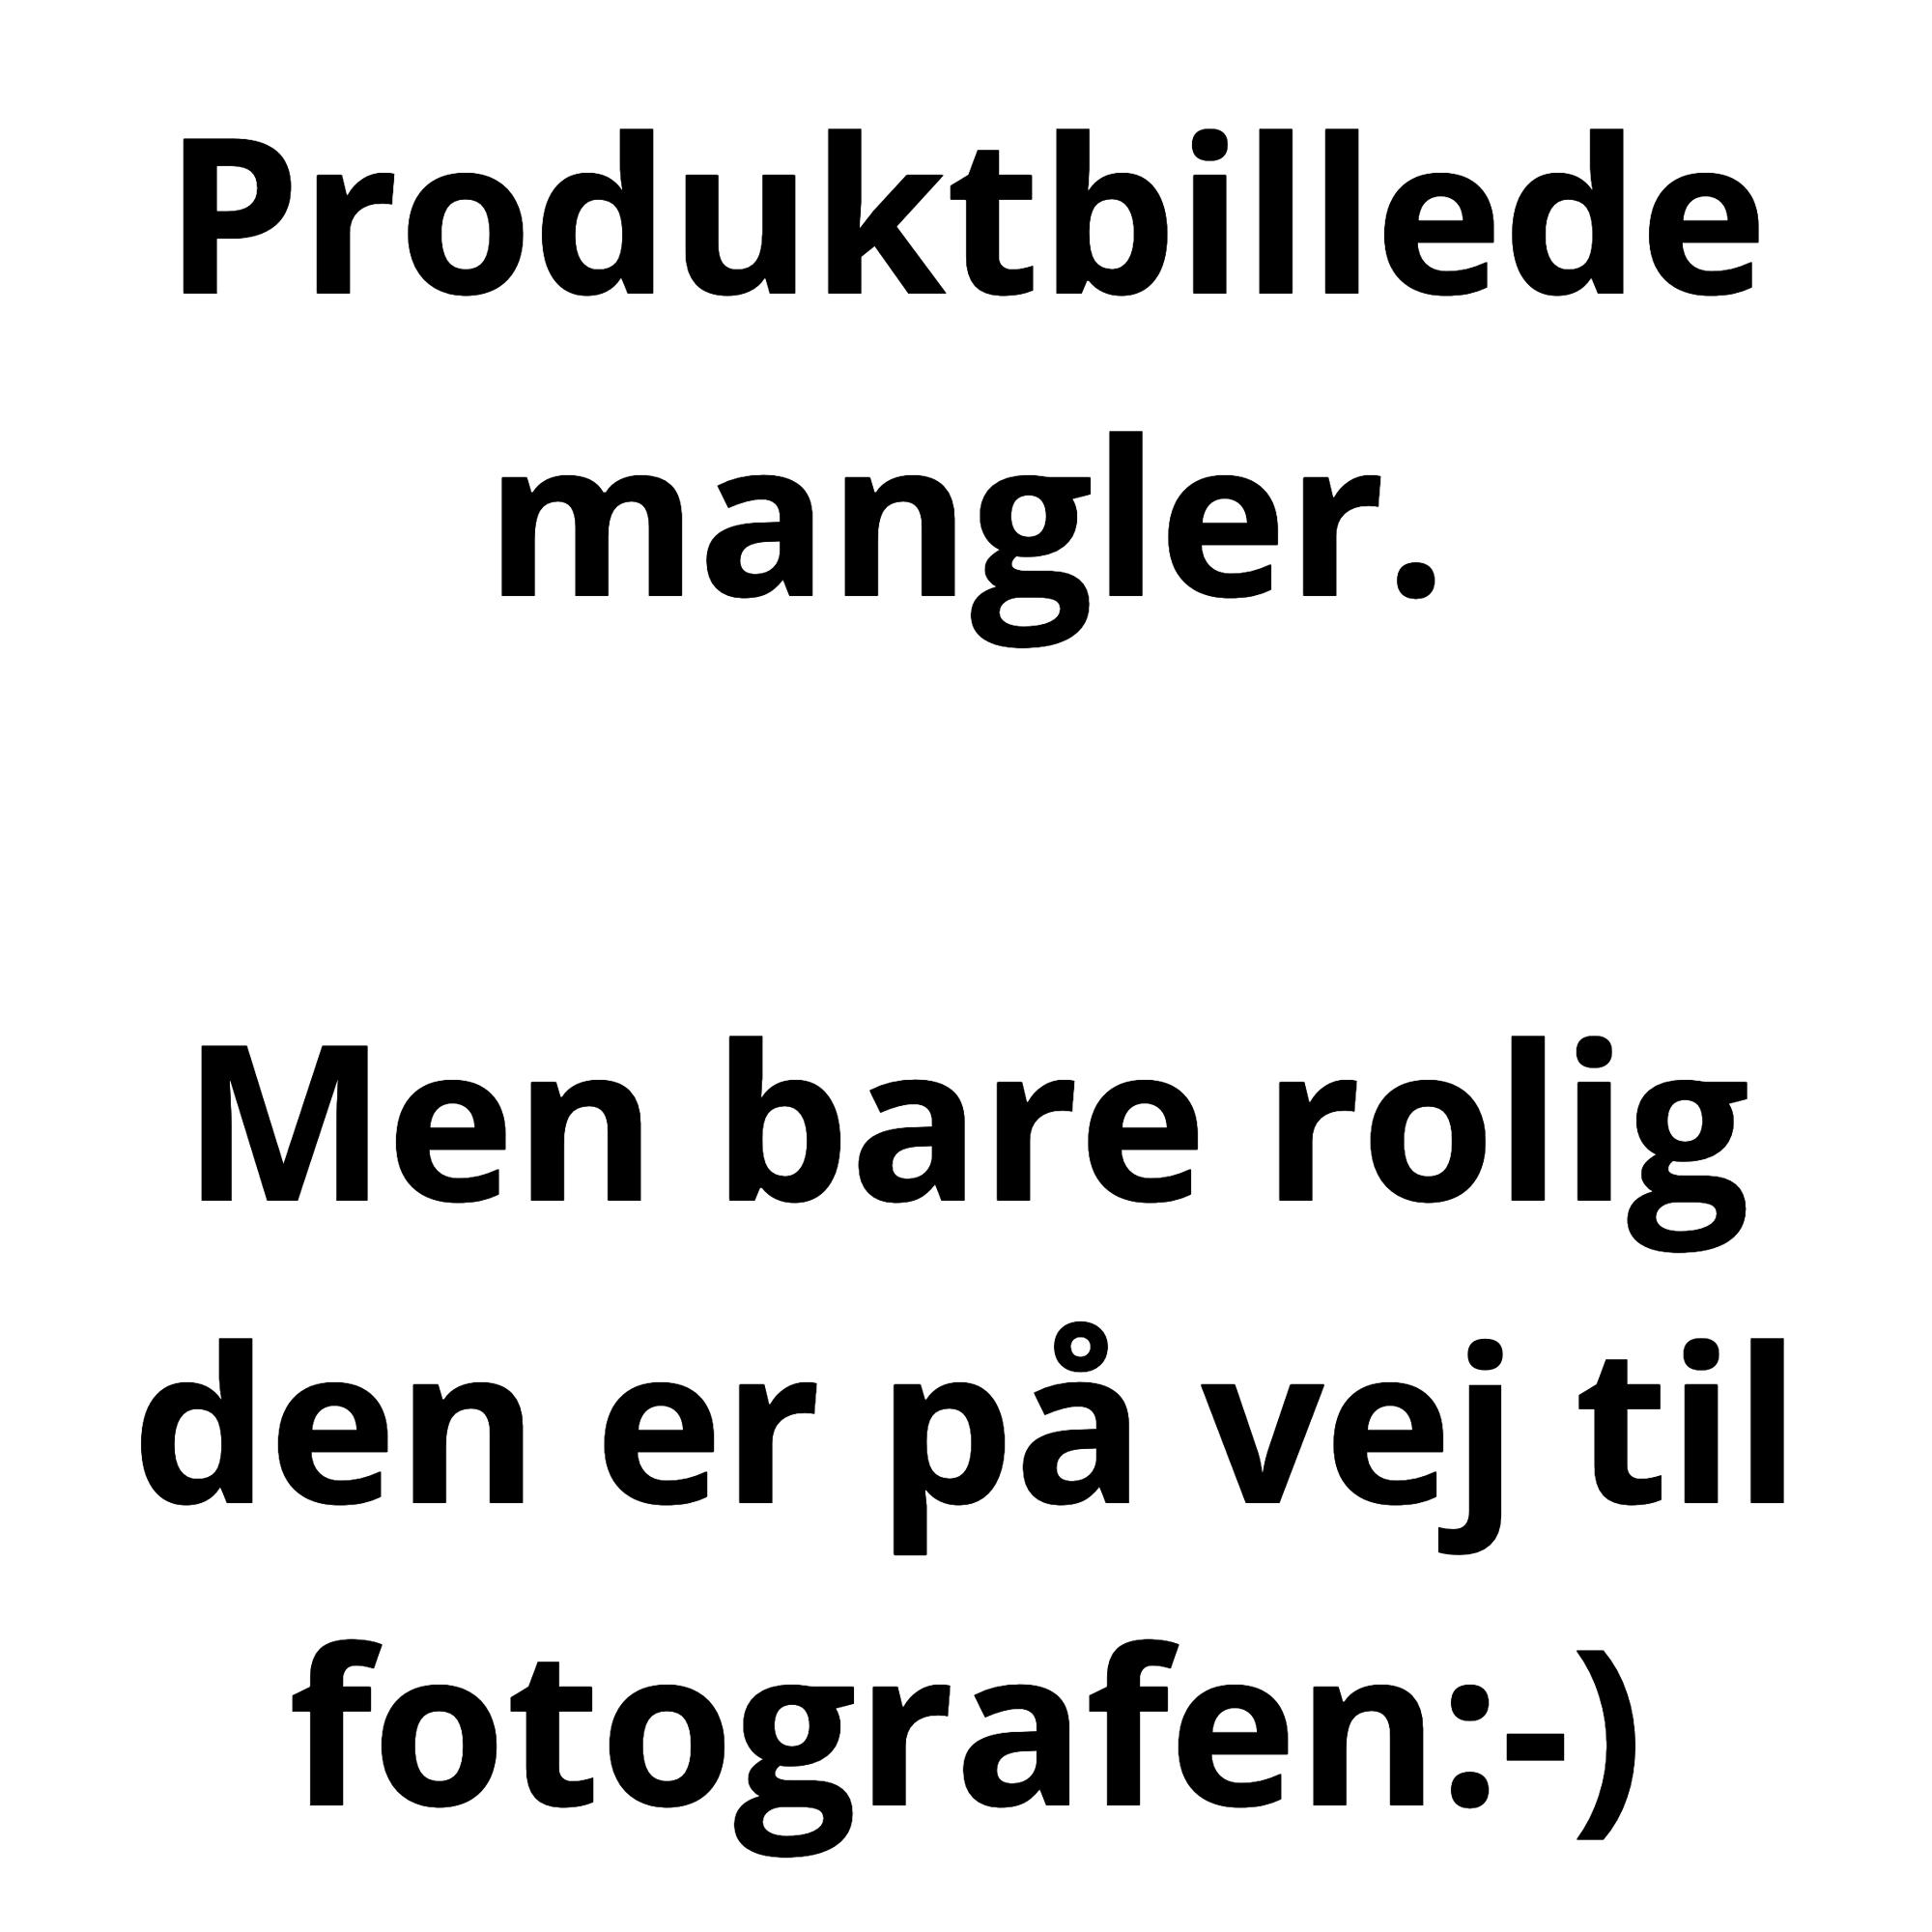 Brodit Aktiv Tablet Holder til Apple iPad 5th. gen./ 6.th gen. 9.7/ Air med lås - 546577